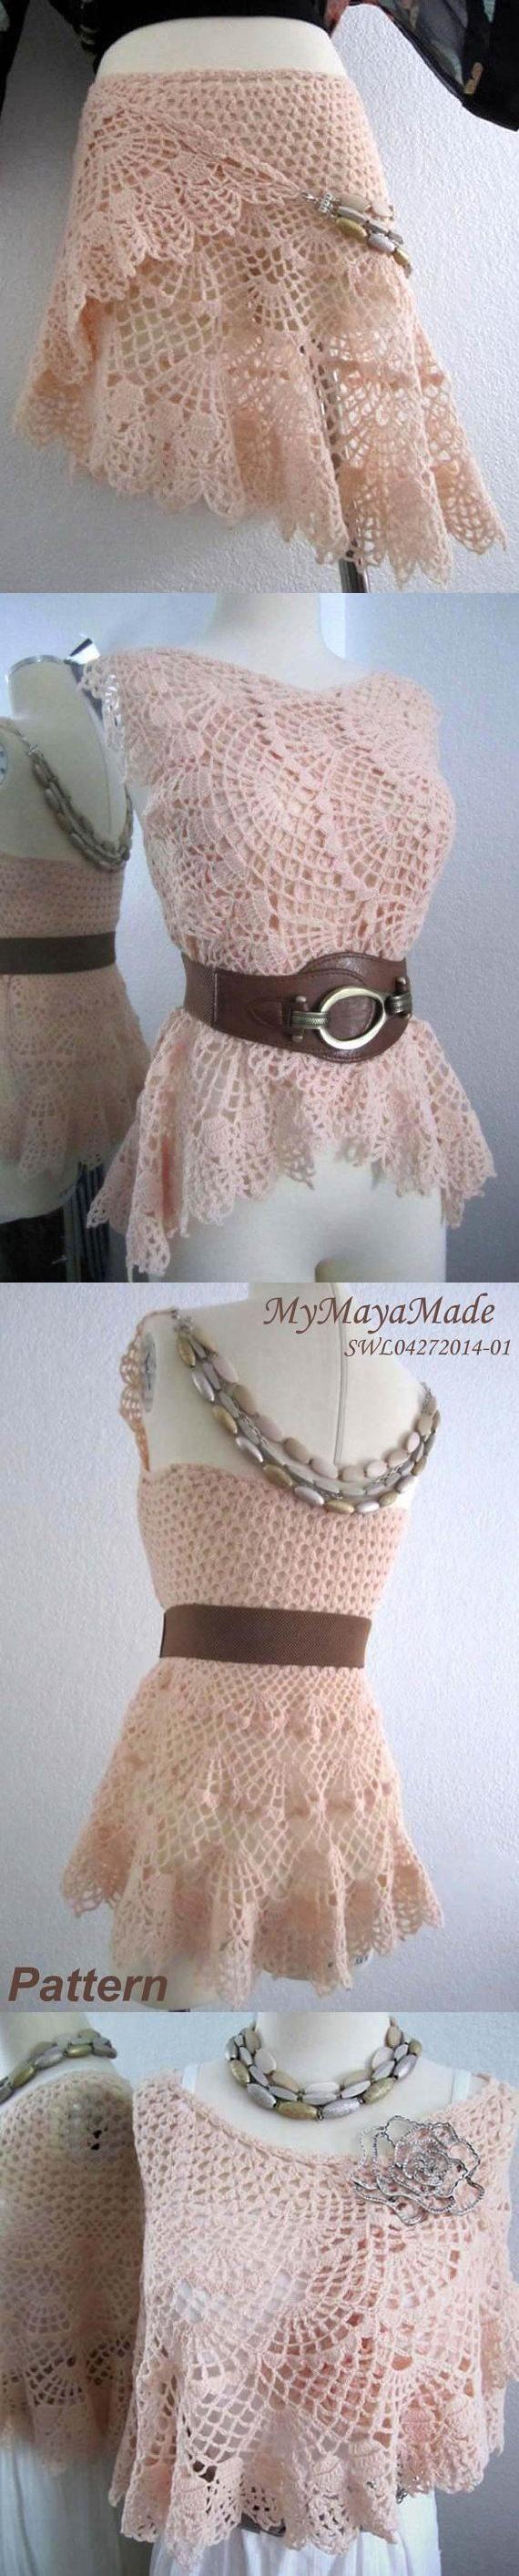 Crochet Pattern - Lithe and Pierced Crochet Dress, Shawl or Skirt